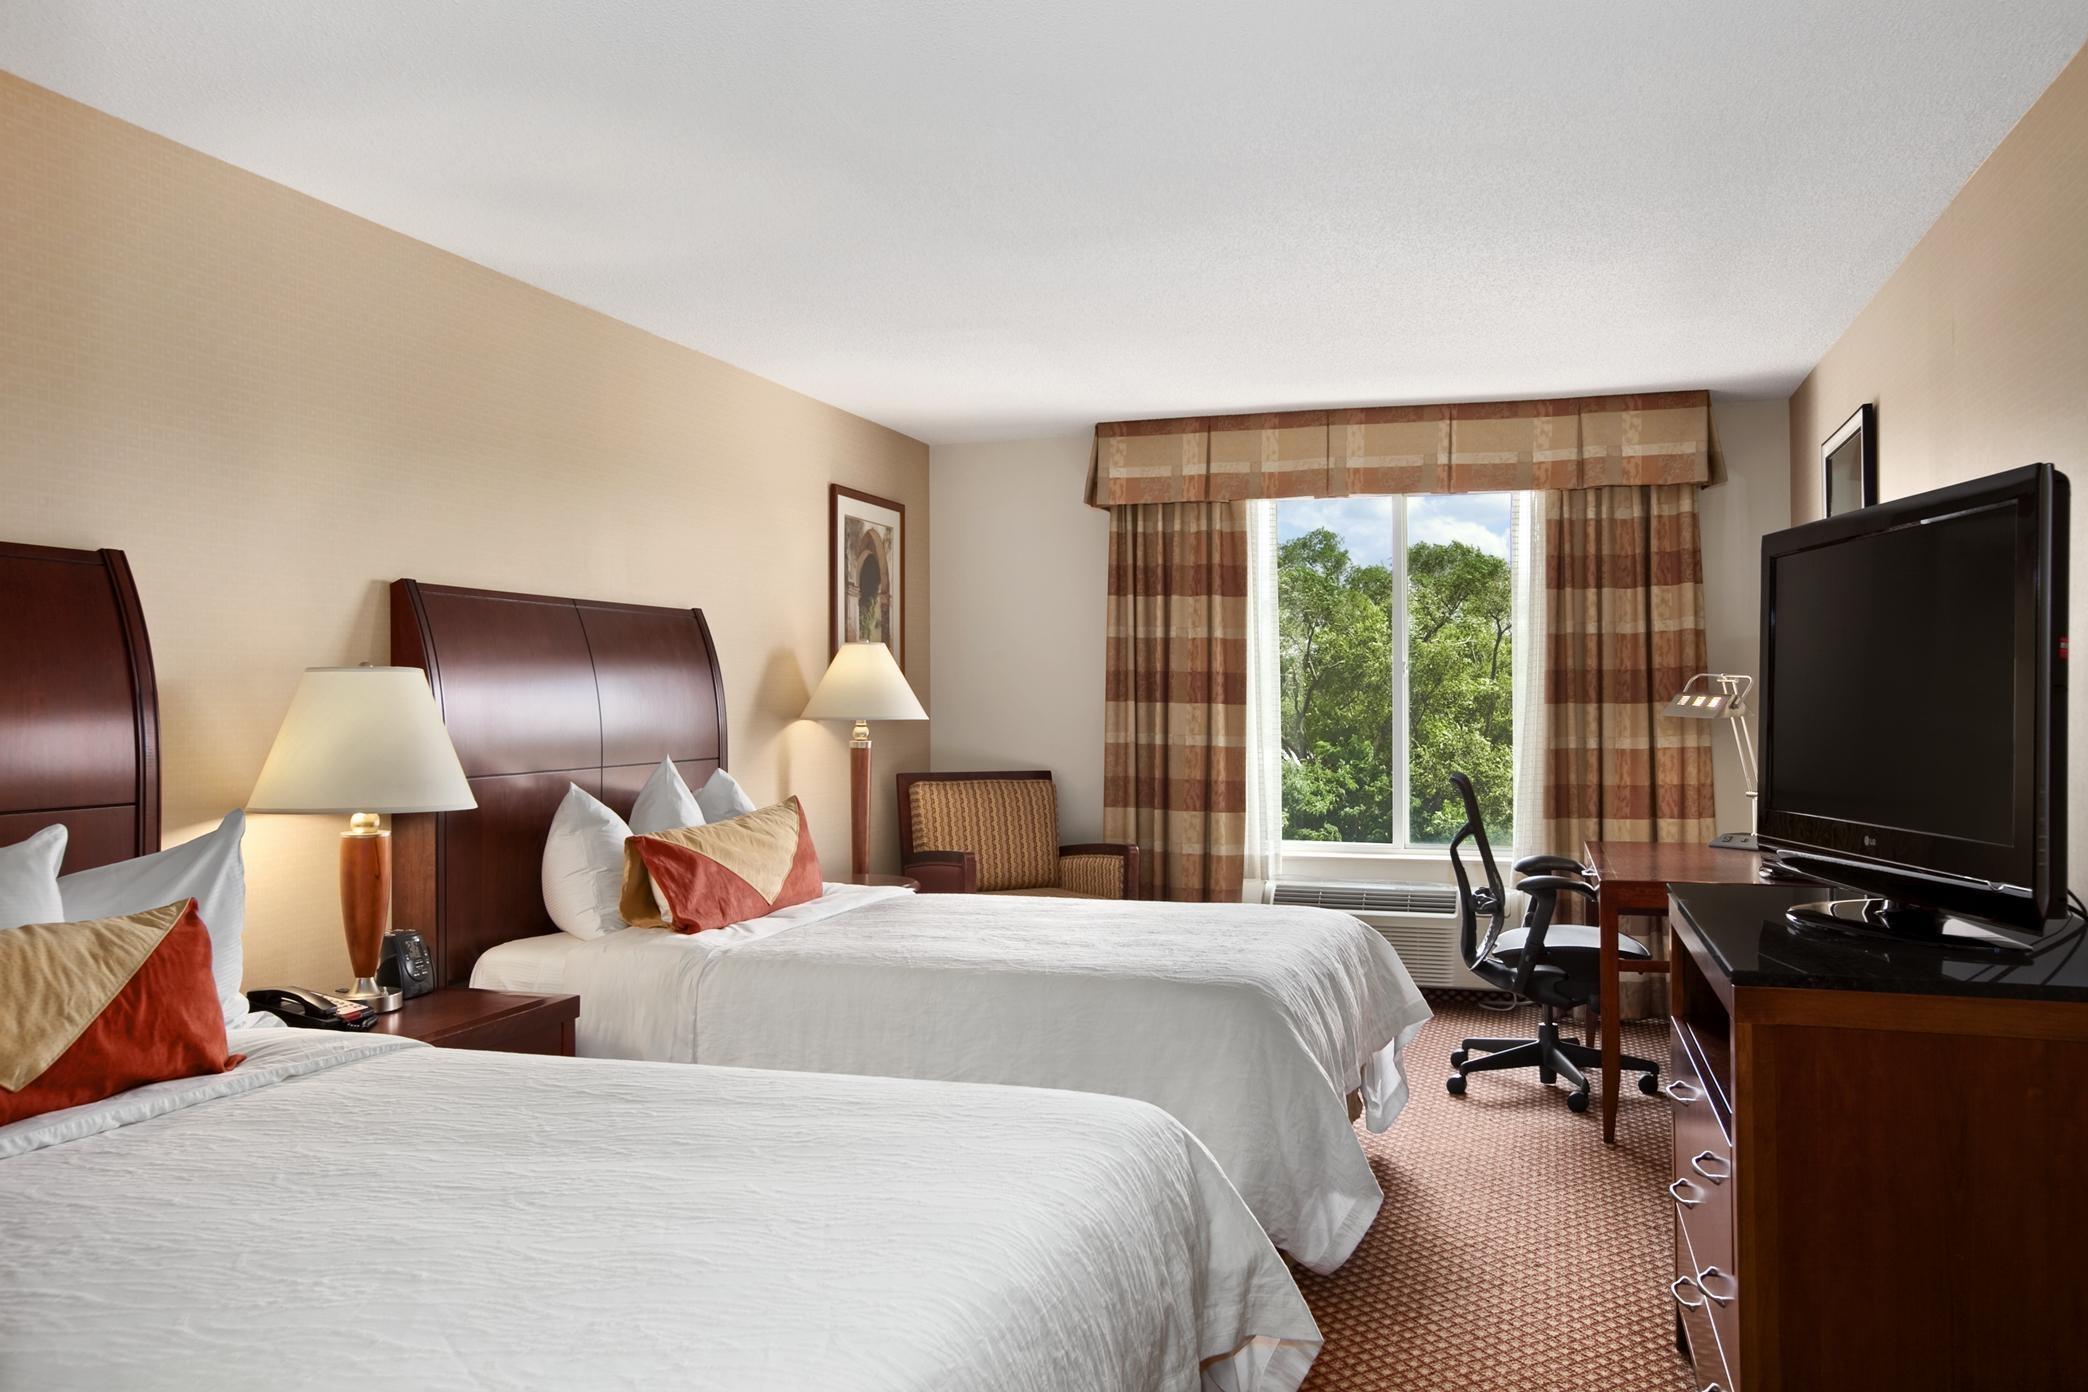 Hilton Garden Inn Chicago/Oakbrook Terrace image 10